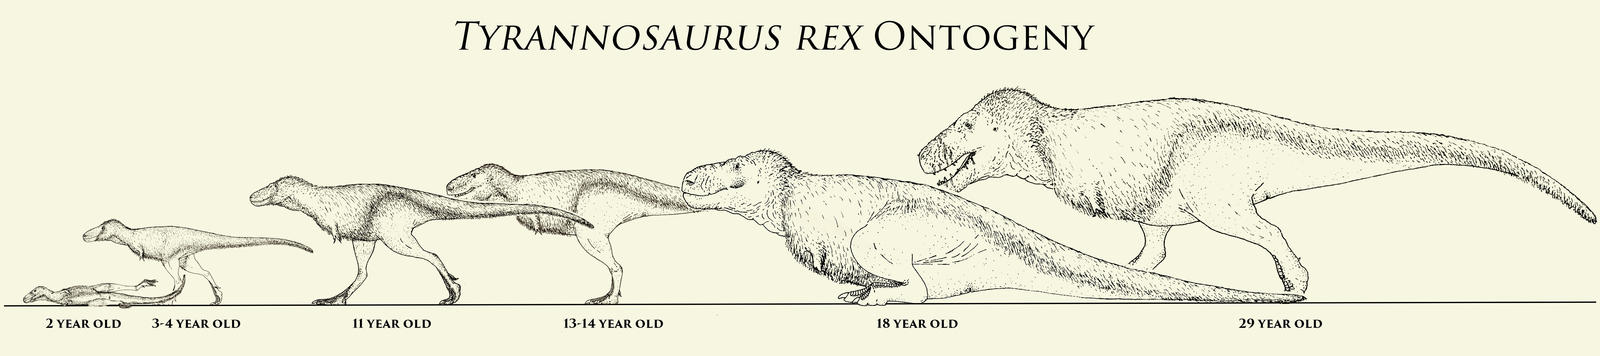 T. rex Ontogeny